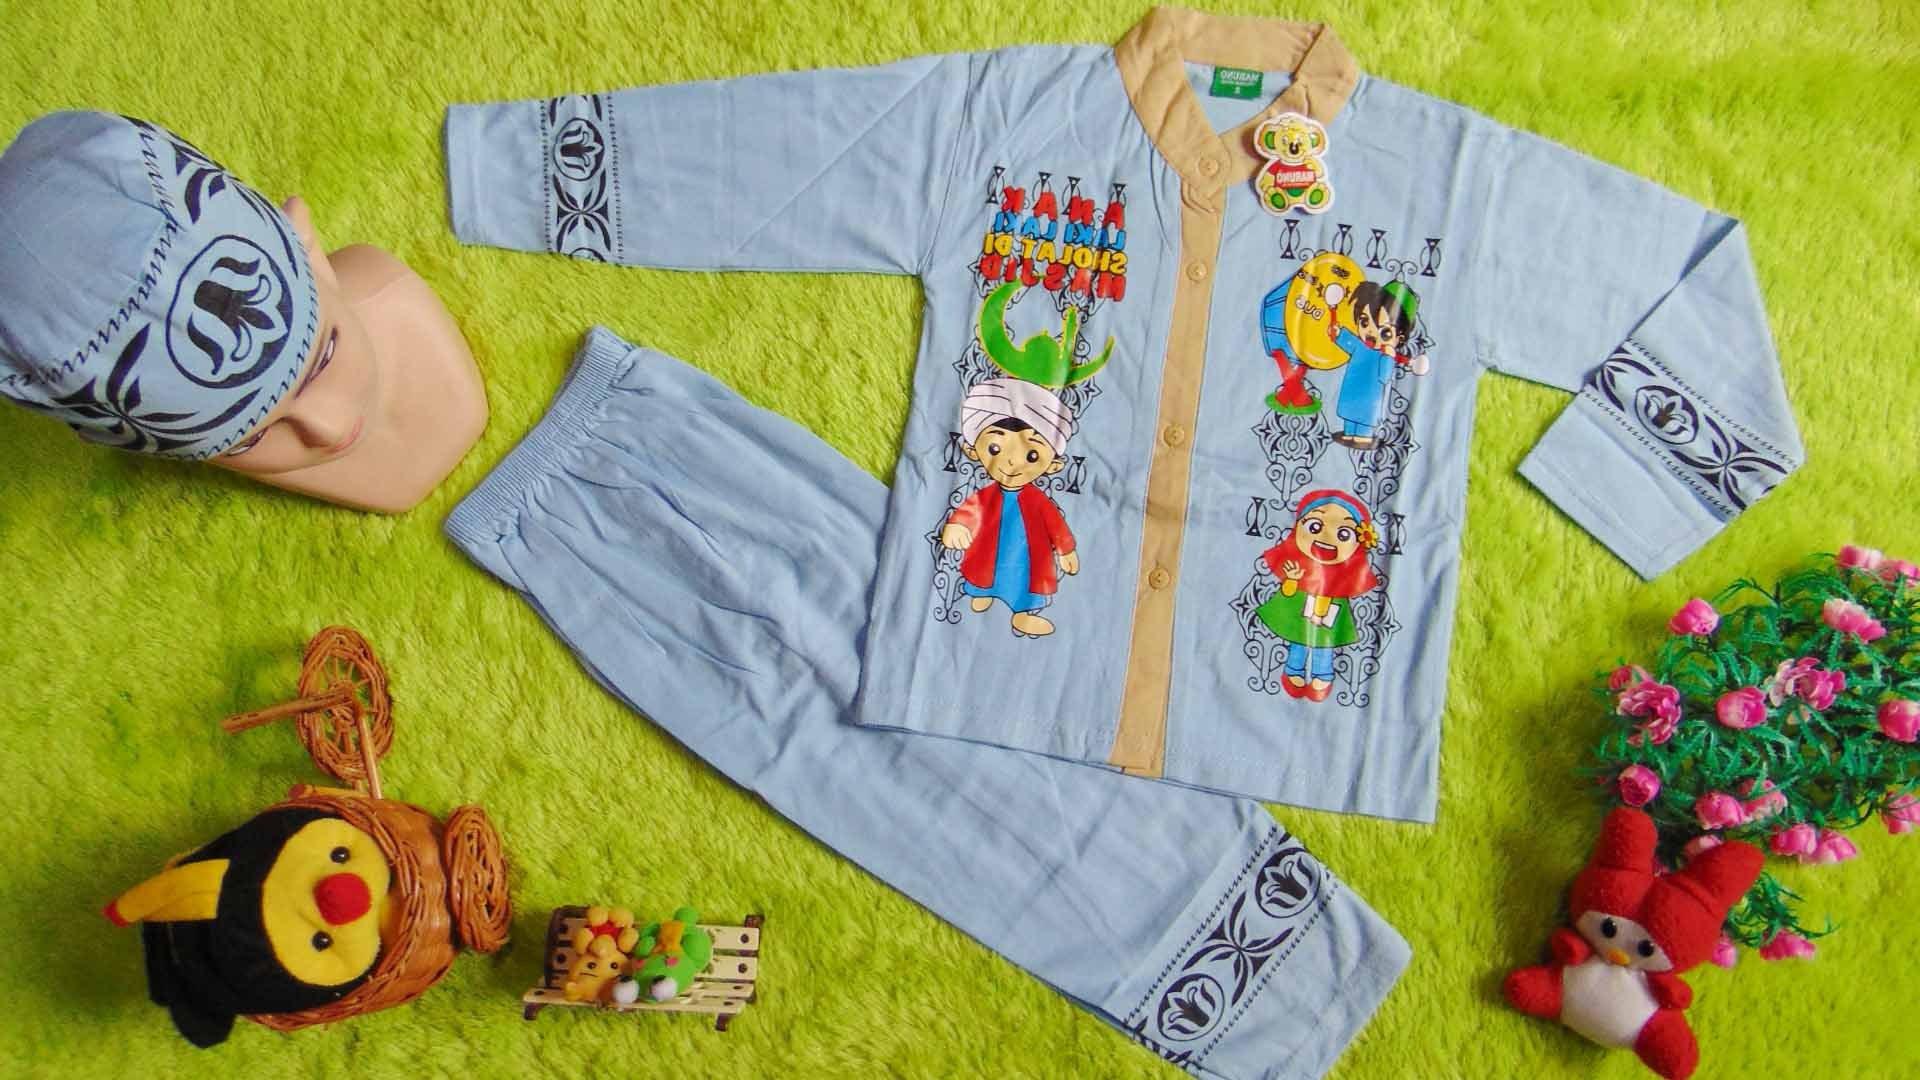 Ide Baju Lebaran Anak 1 Tahun X8d1 Paling Laris Setelan Baju Koko Muslim Lebaran Ramadhan